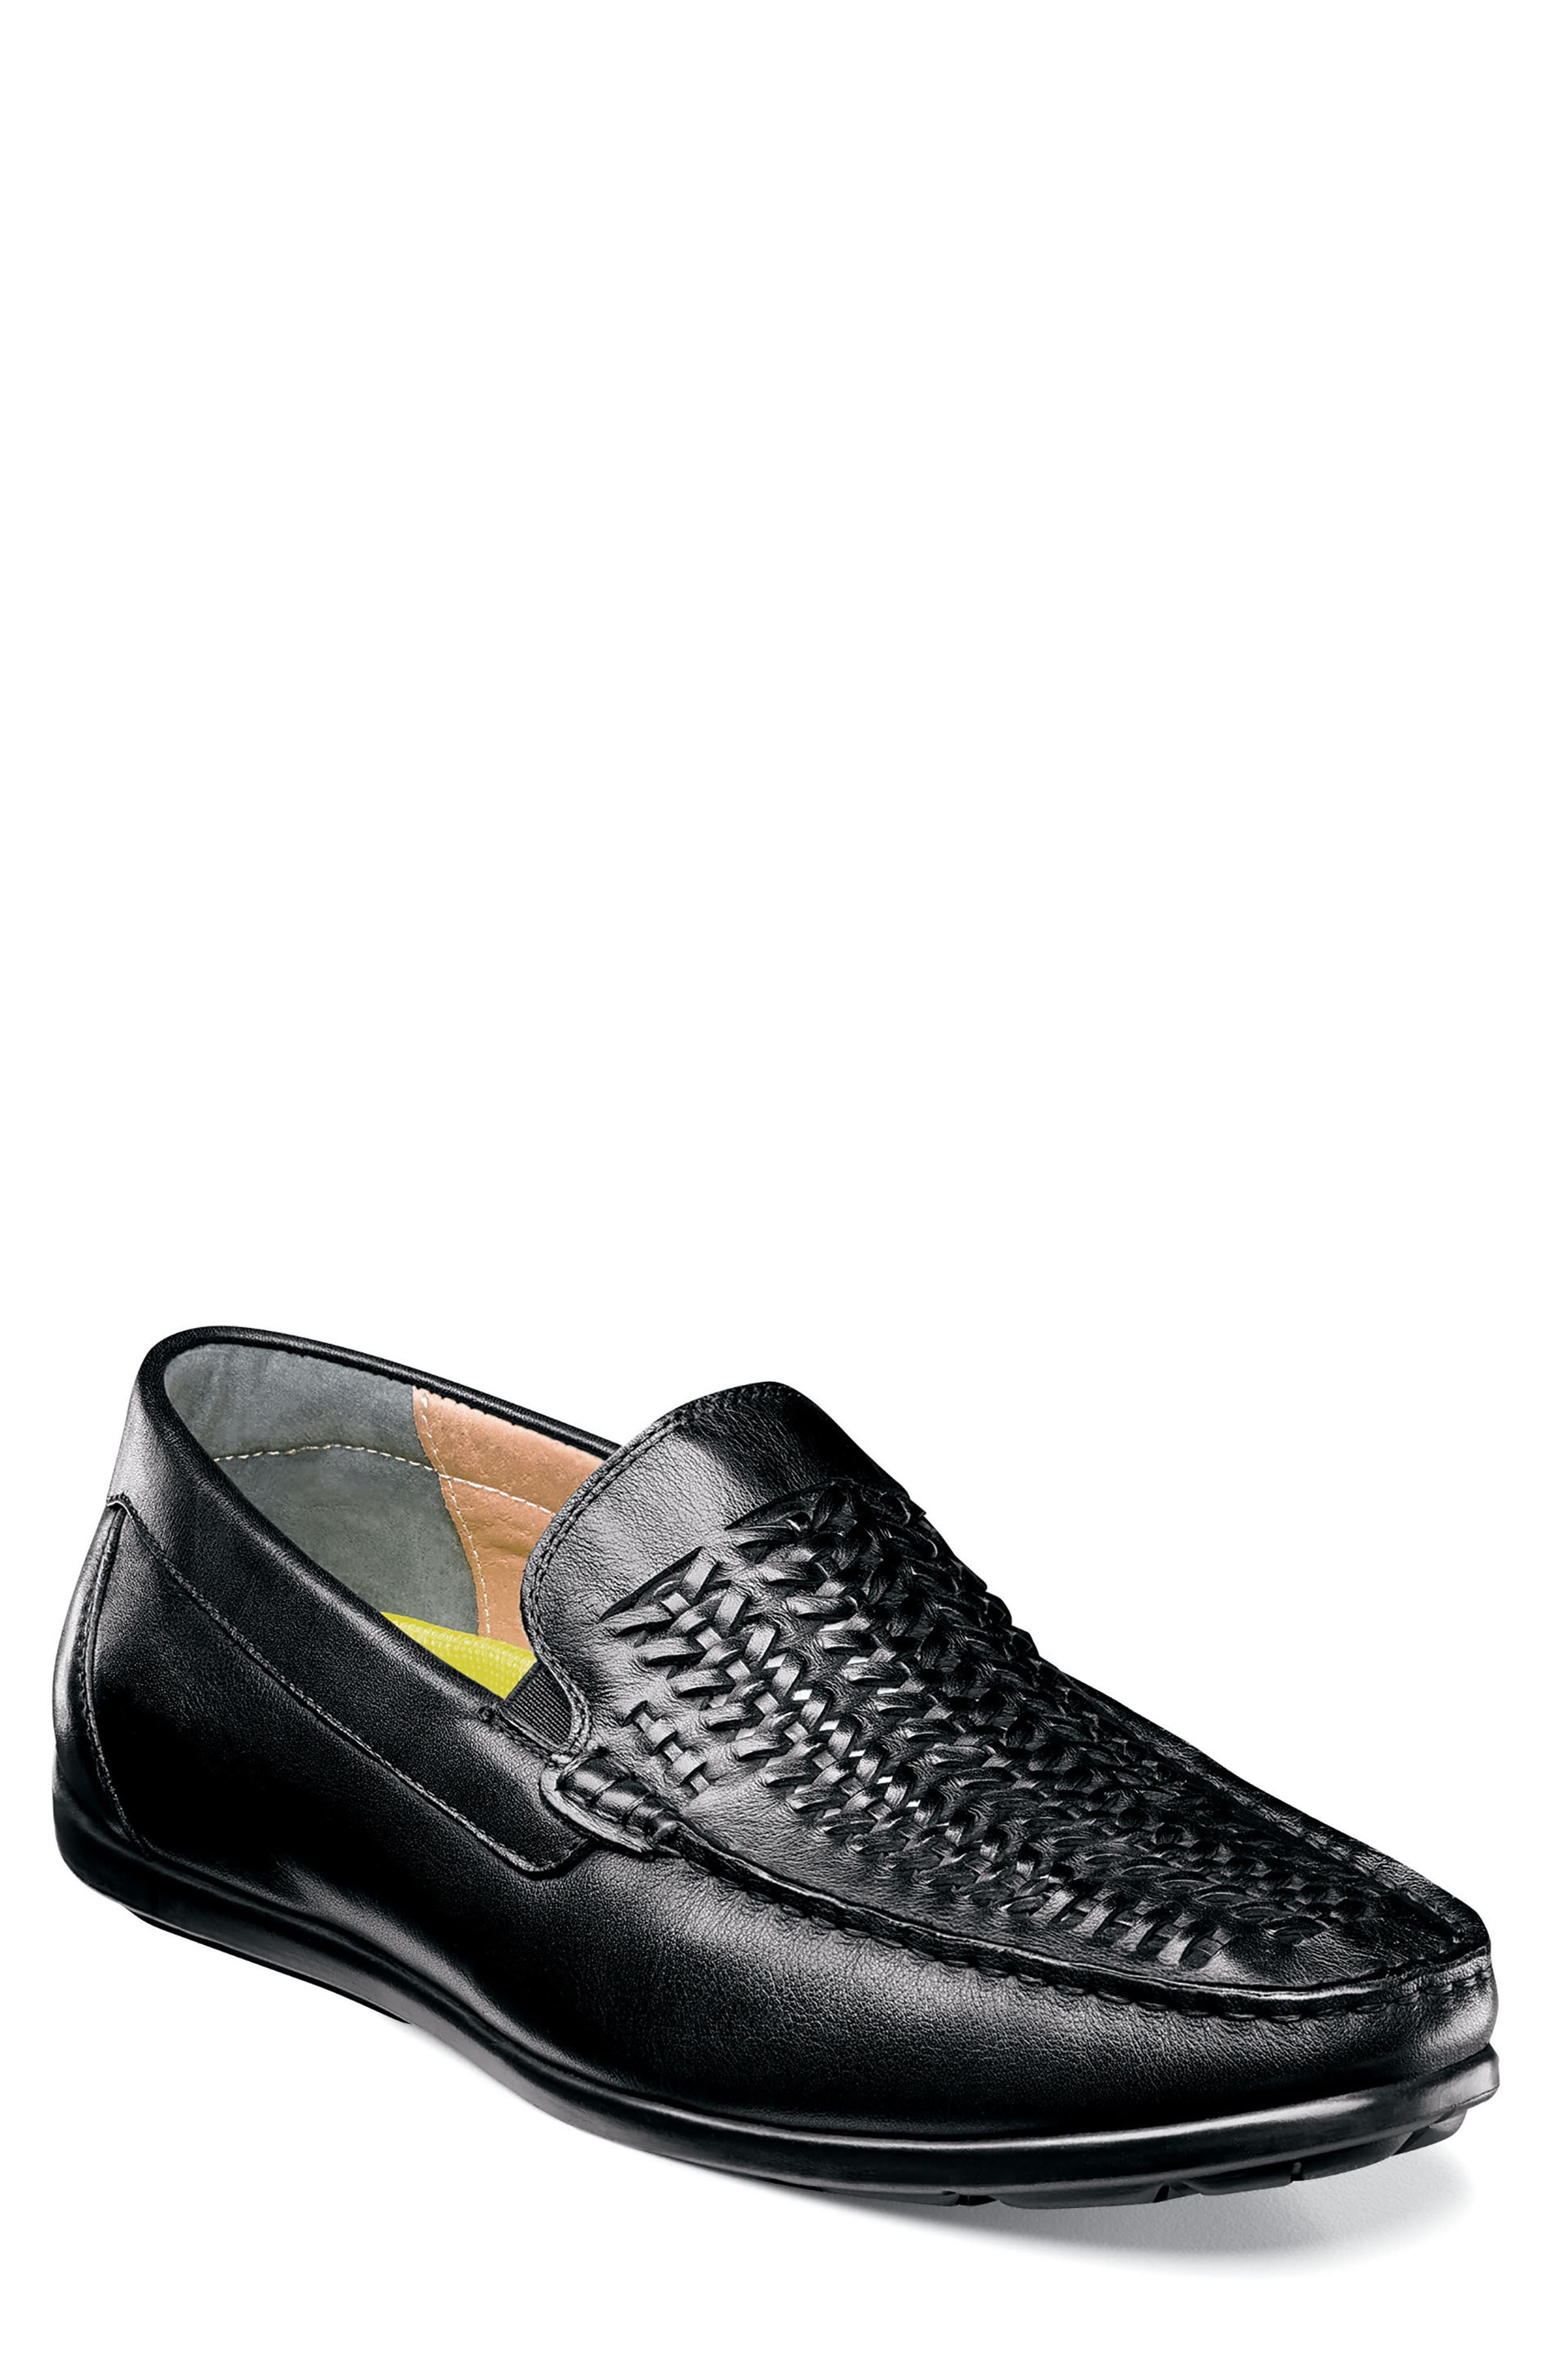 Comfortech Draft Loafer,                         Main,                         color, Black/Black Leather